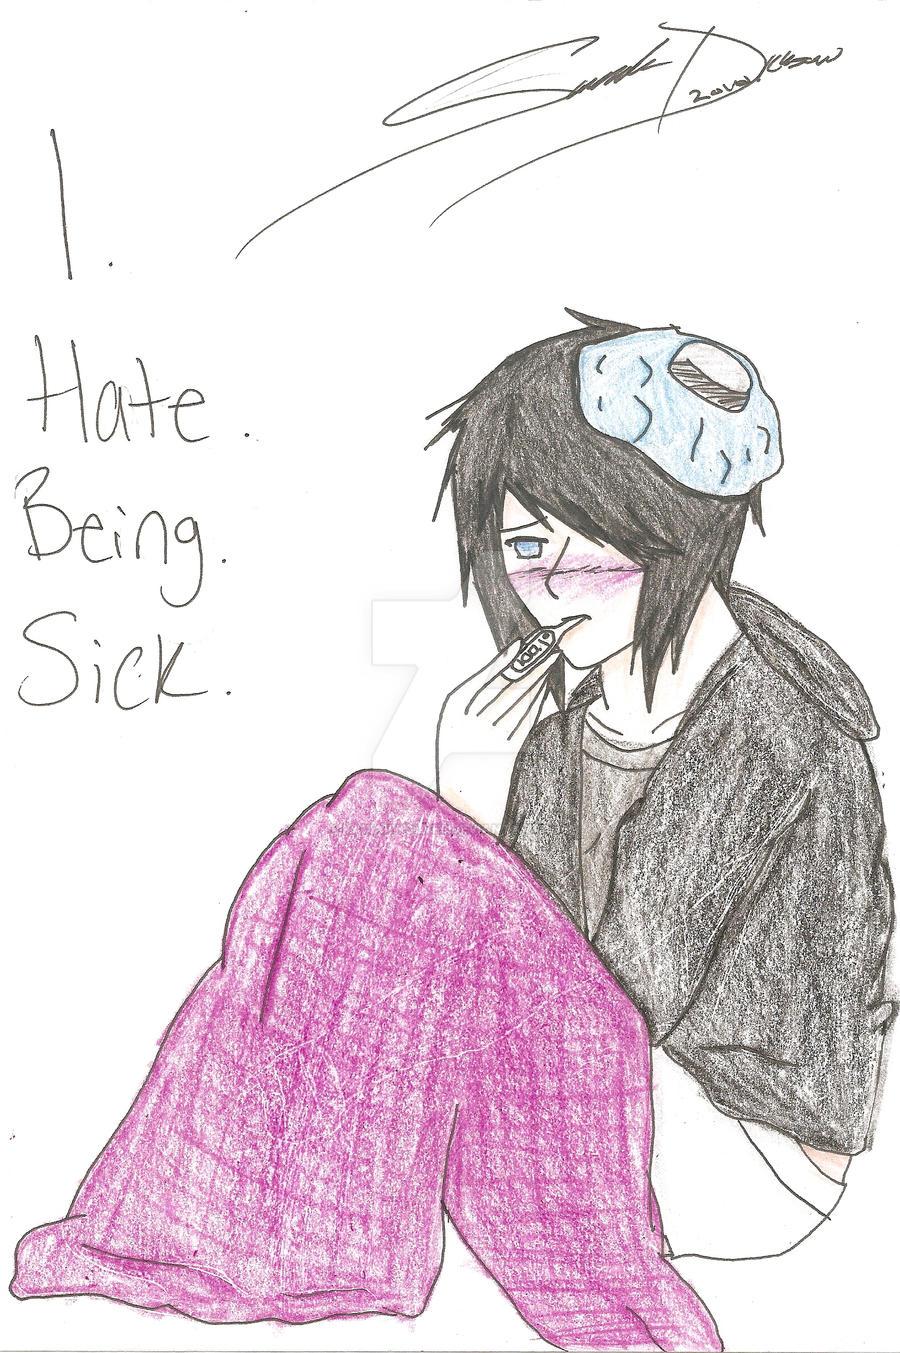 Feeling Sick Tumblr Quotes | www.pixshark.com - Images ...